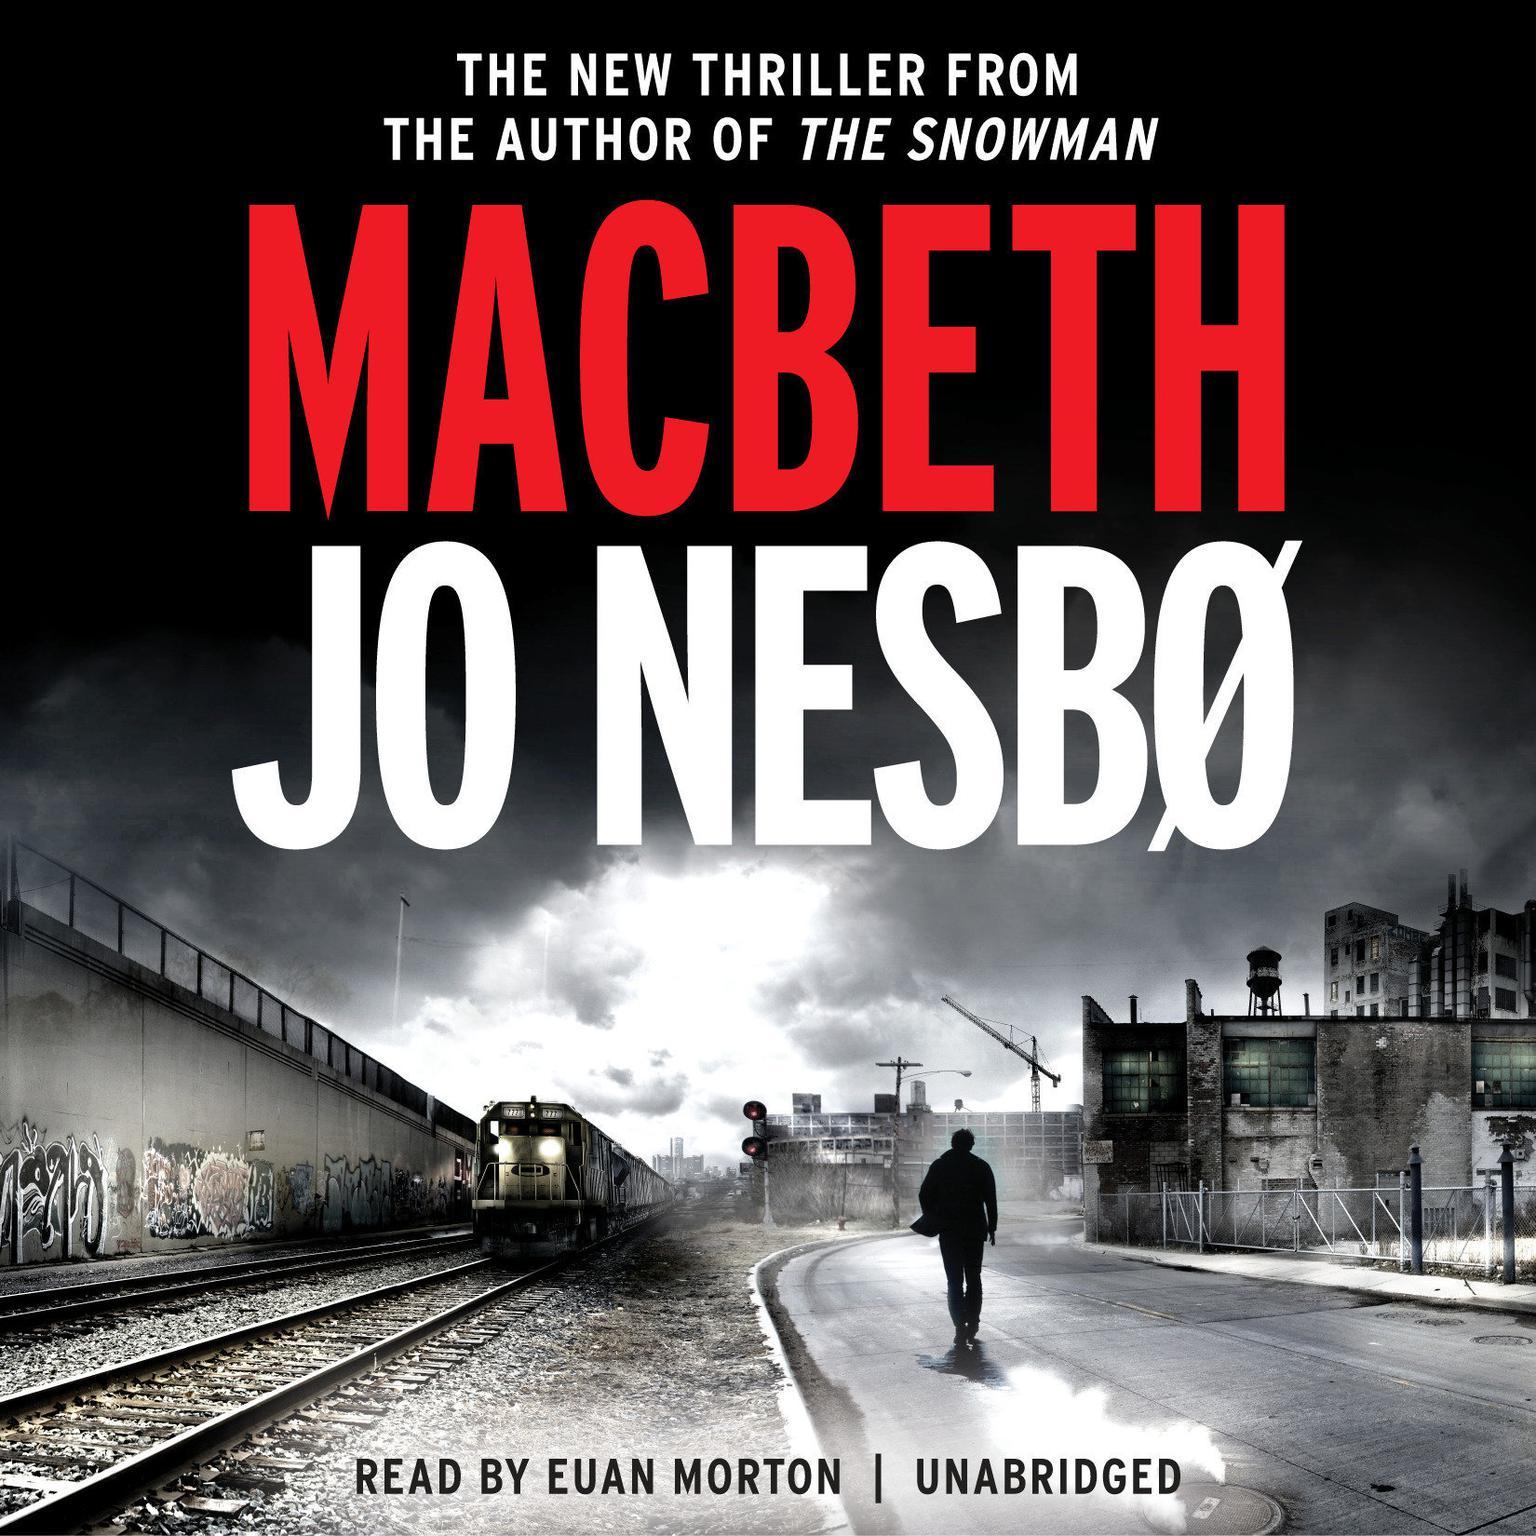 Macbeth: William Shakespeares Macbeth Retold: A Novel Audiobook, by Jo Nesbø